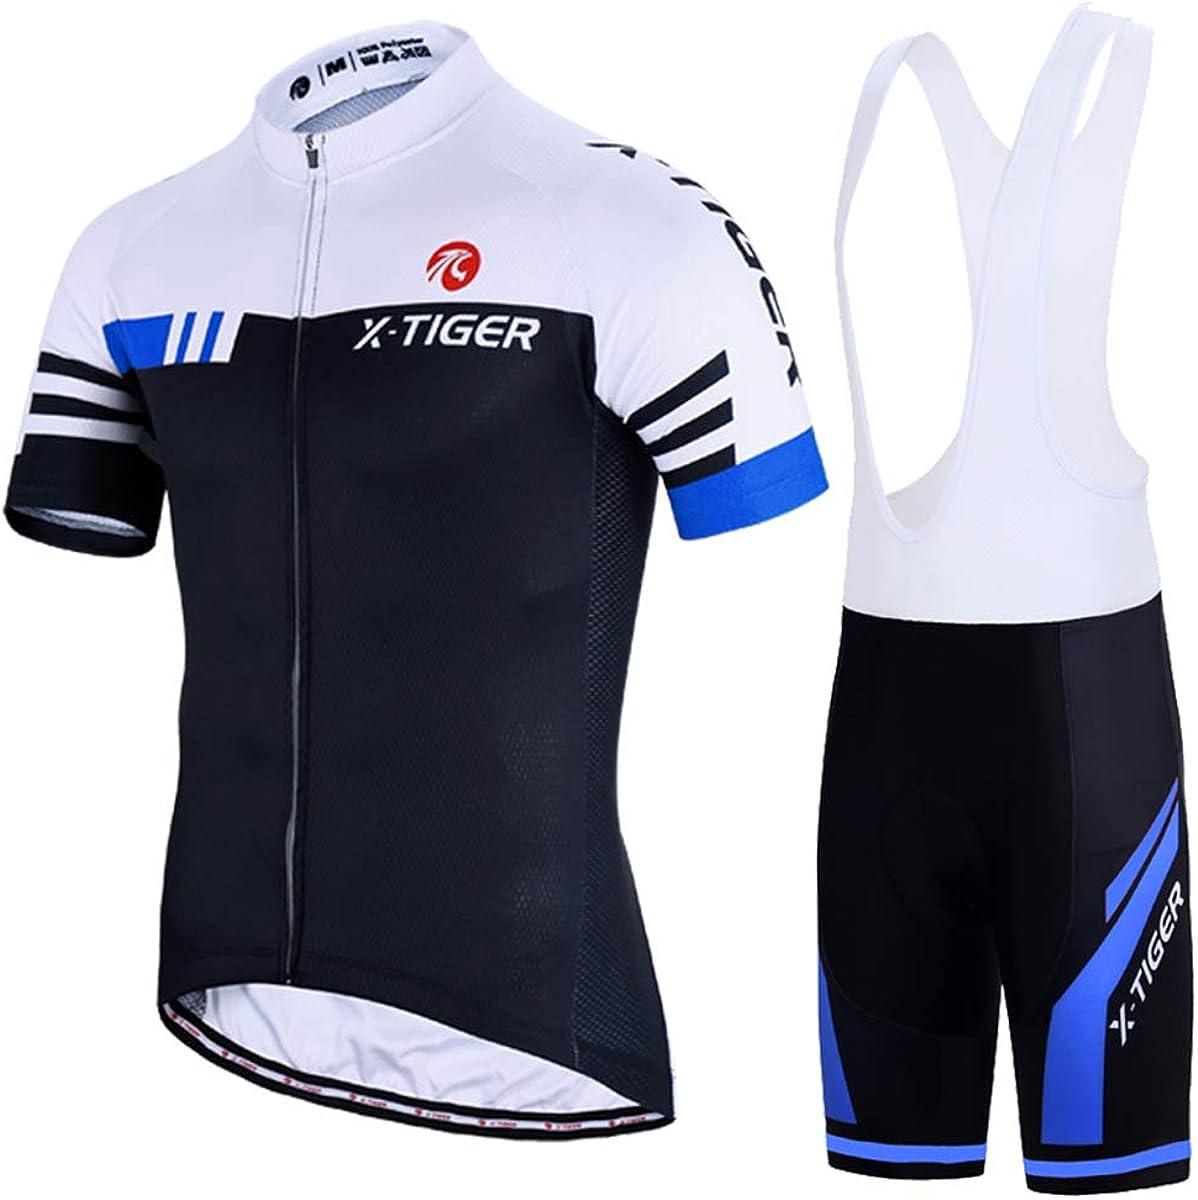 X-TIGER Hombres de Bicicleta con 5D Gel Acolchado MTB Ciclismo Maillots Tirantes Culotte Pantalones Cortos Culotes